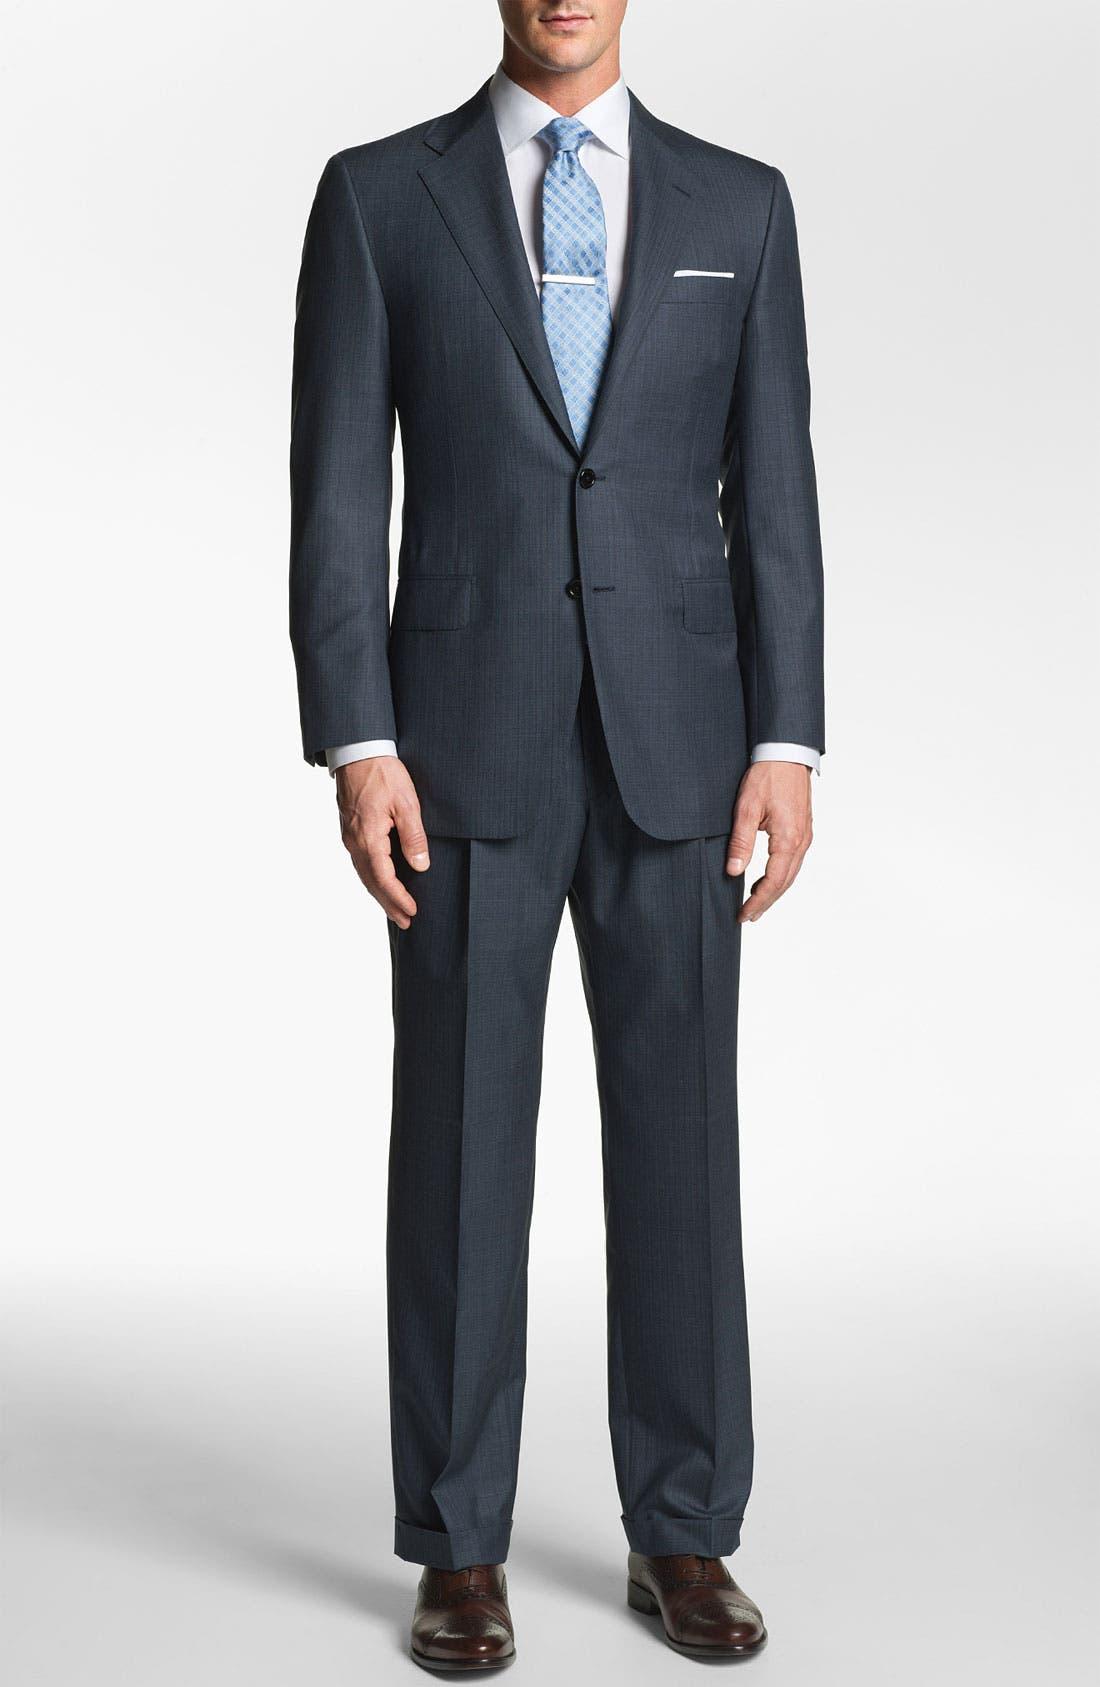 Alternate Image 1 Selected - Hickey Freeman 'Addison' Stripe Suit